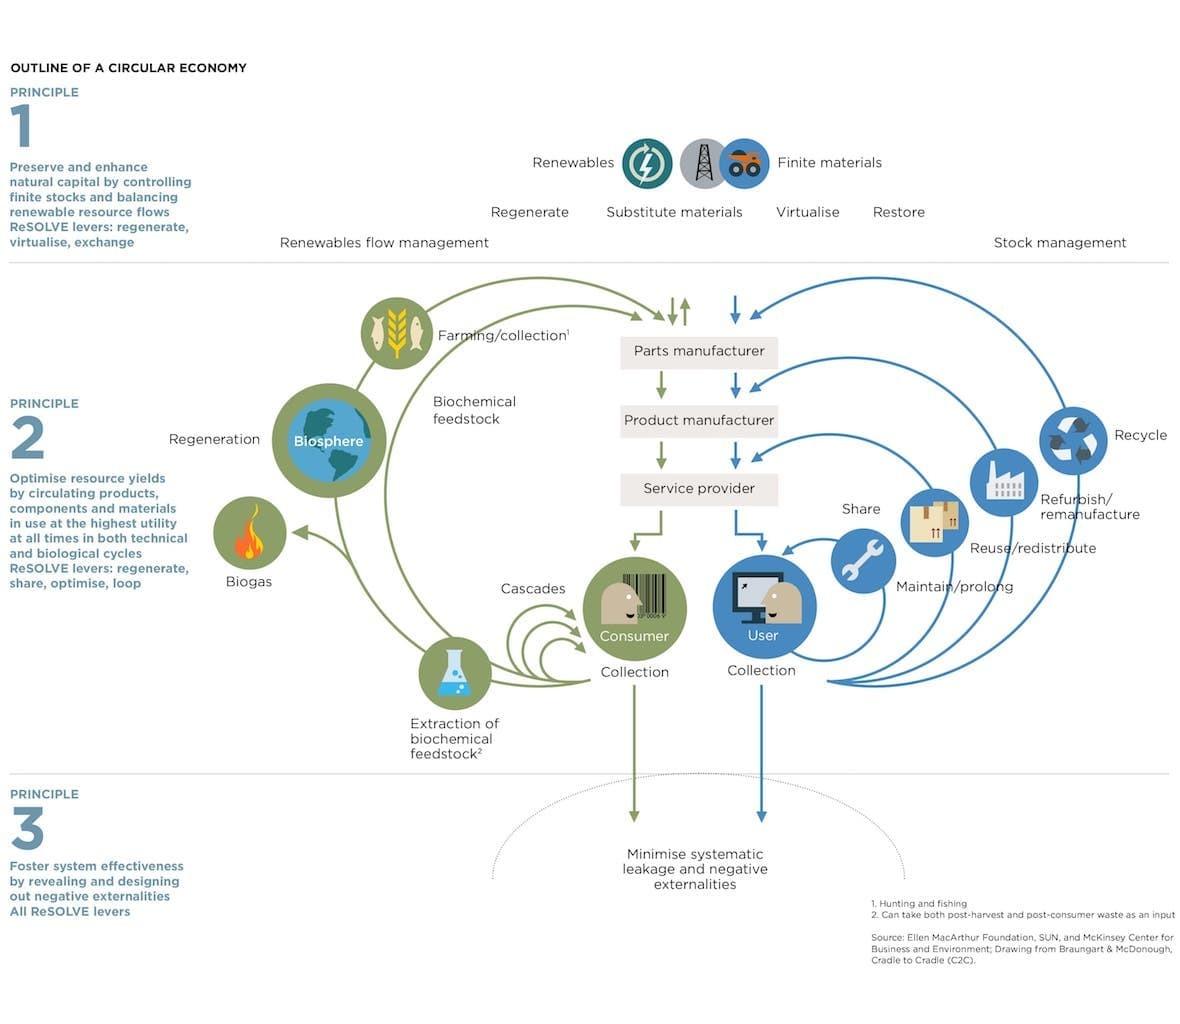 Outline of a circular economy by Ellen MacArthur Foundation